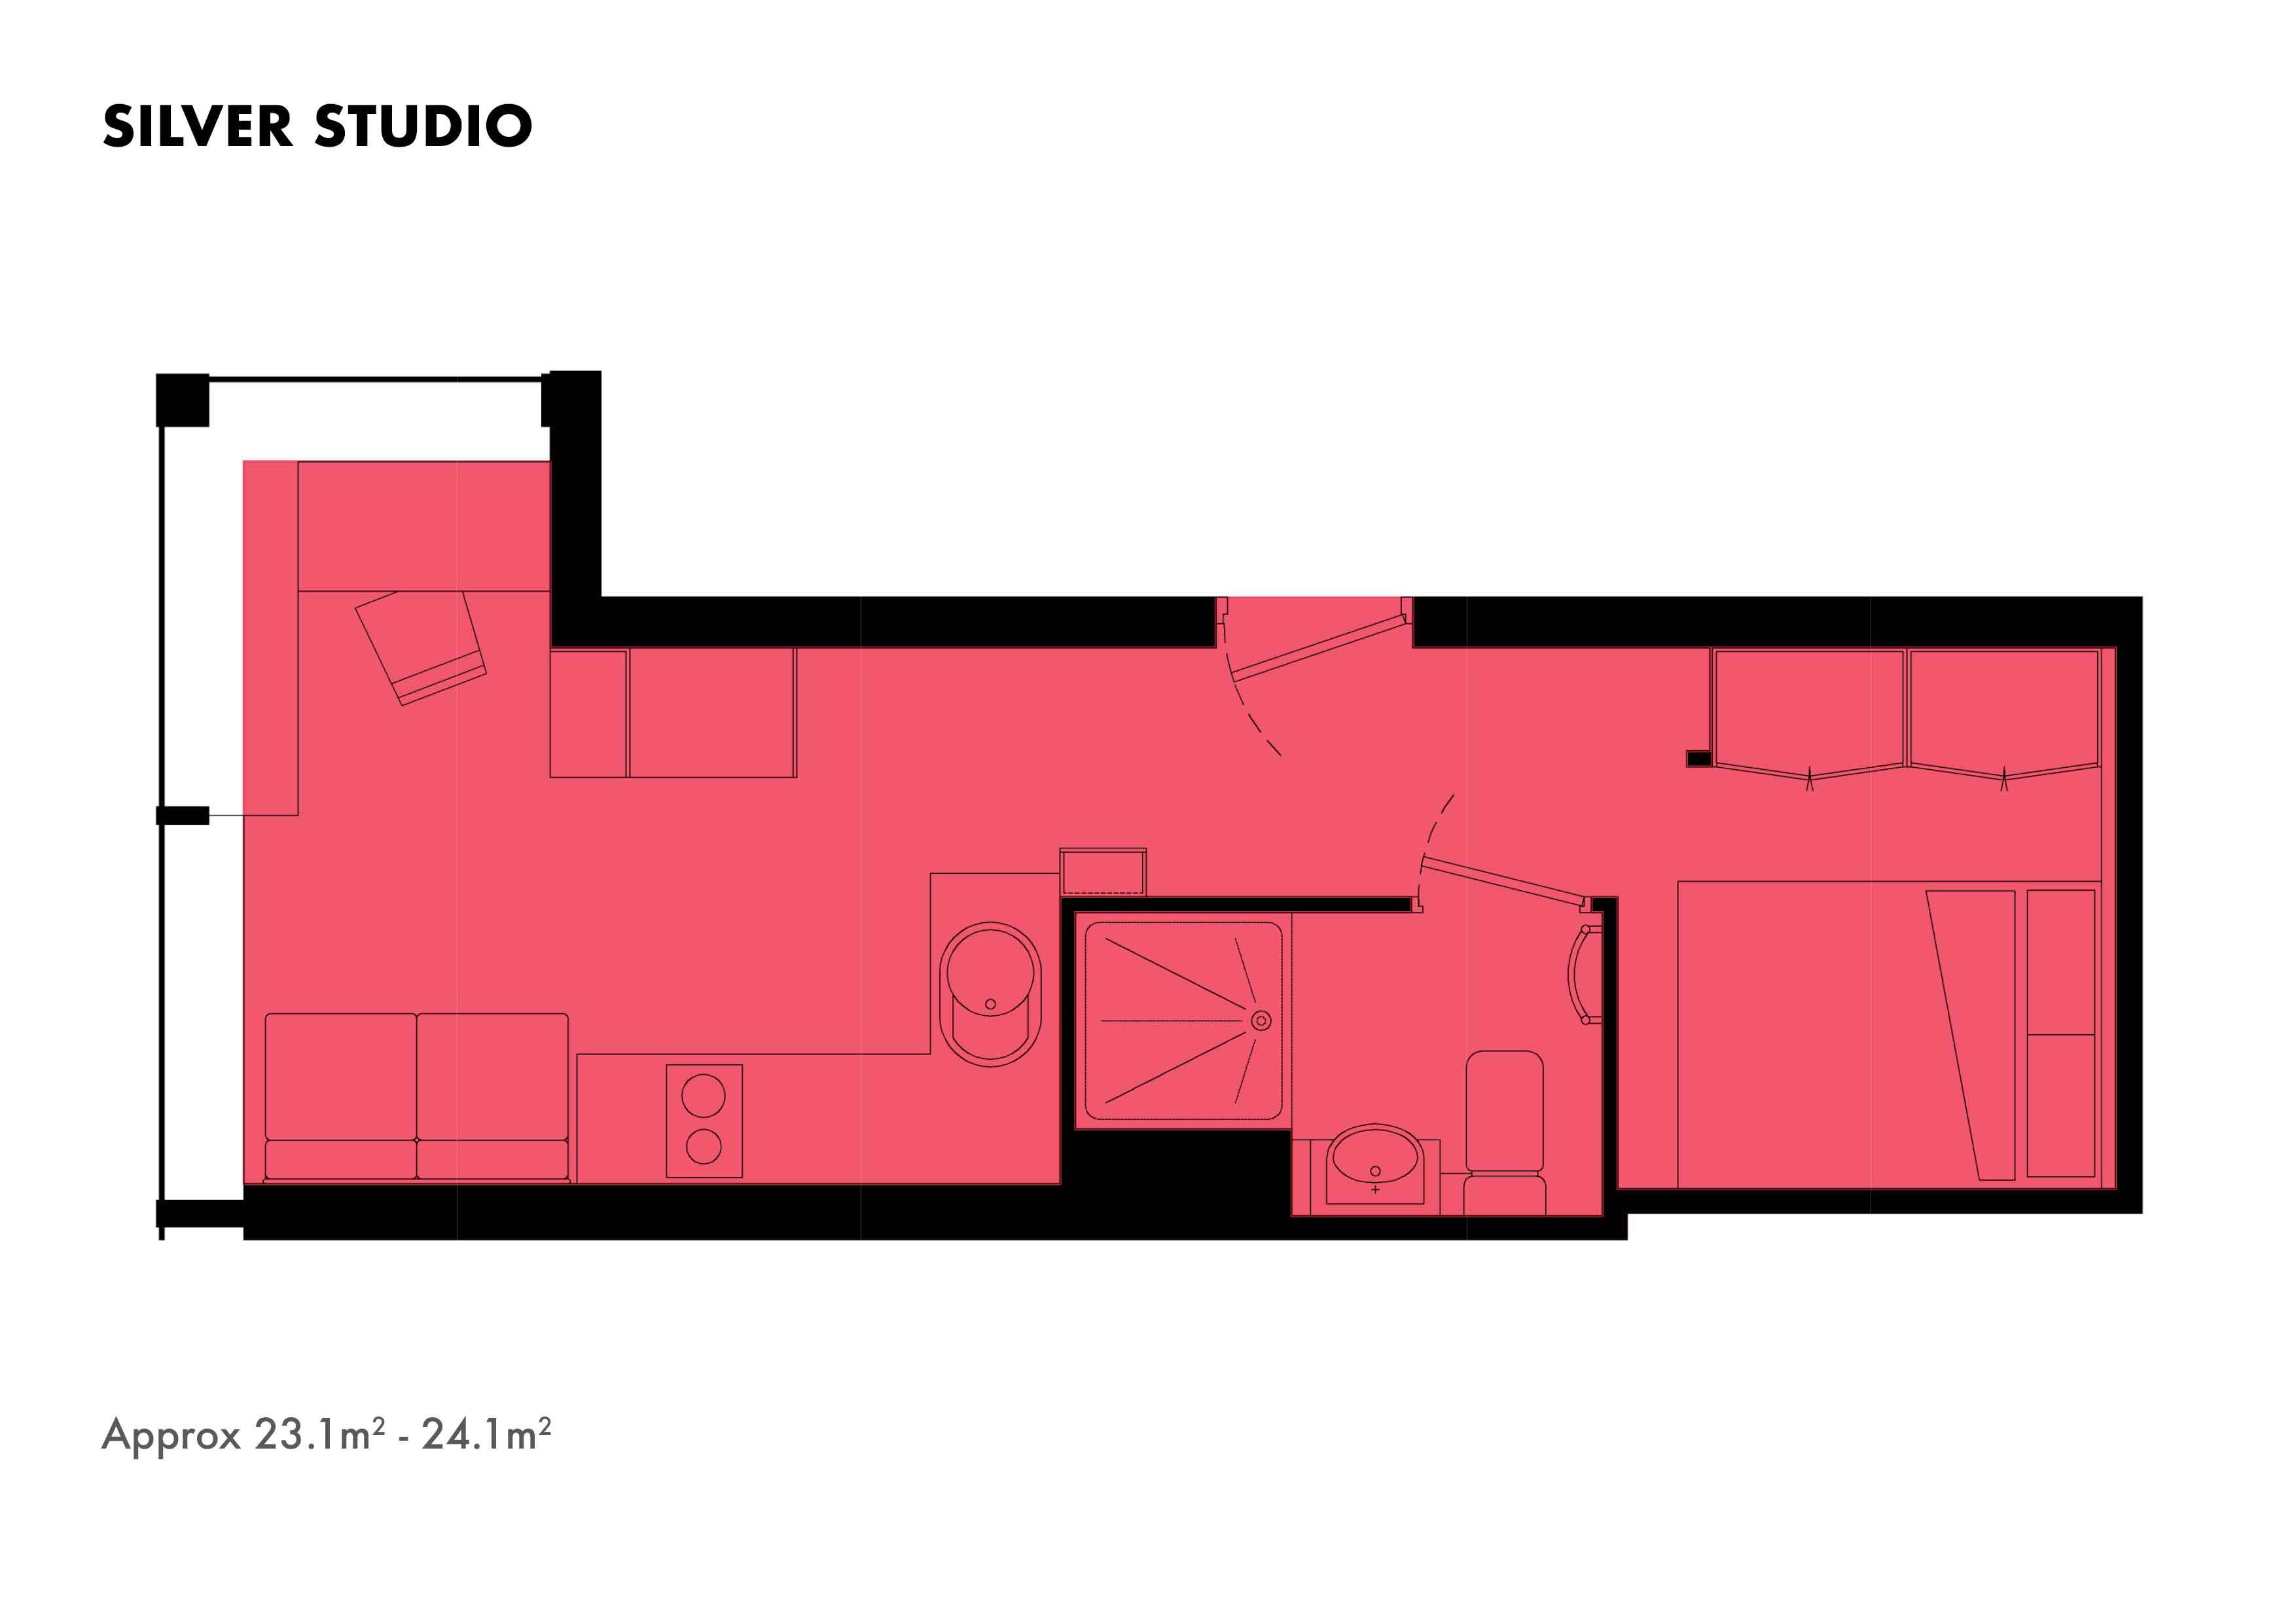 Silver Studio floorplans